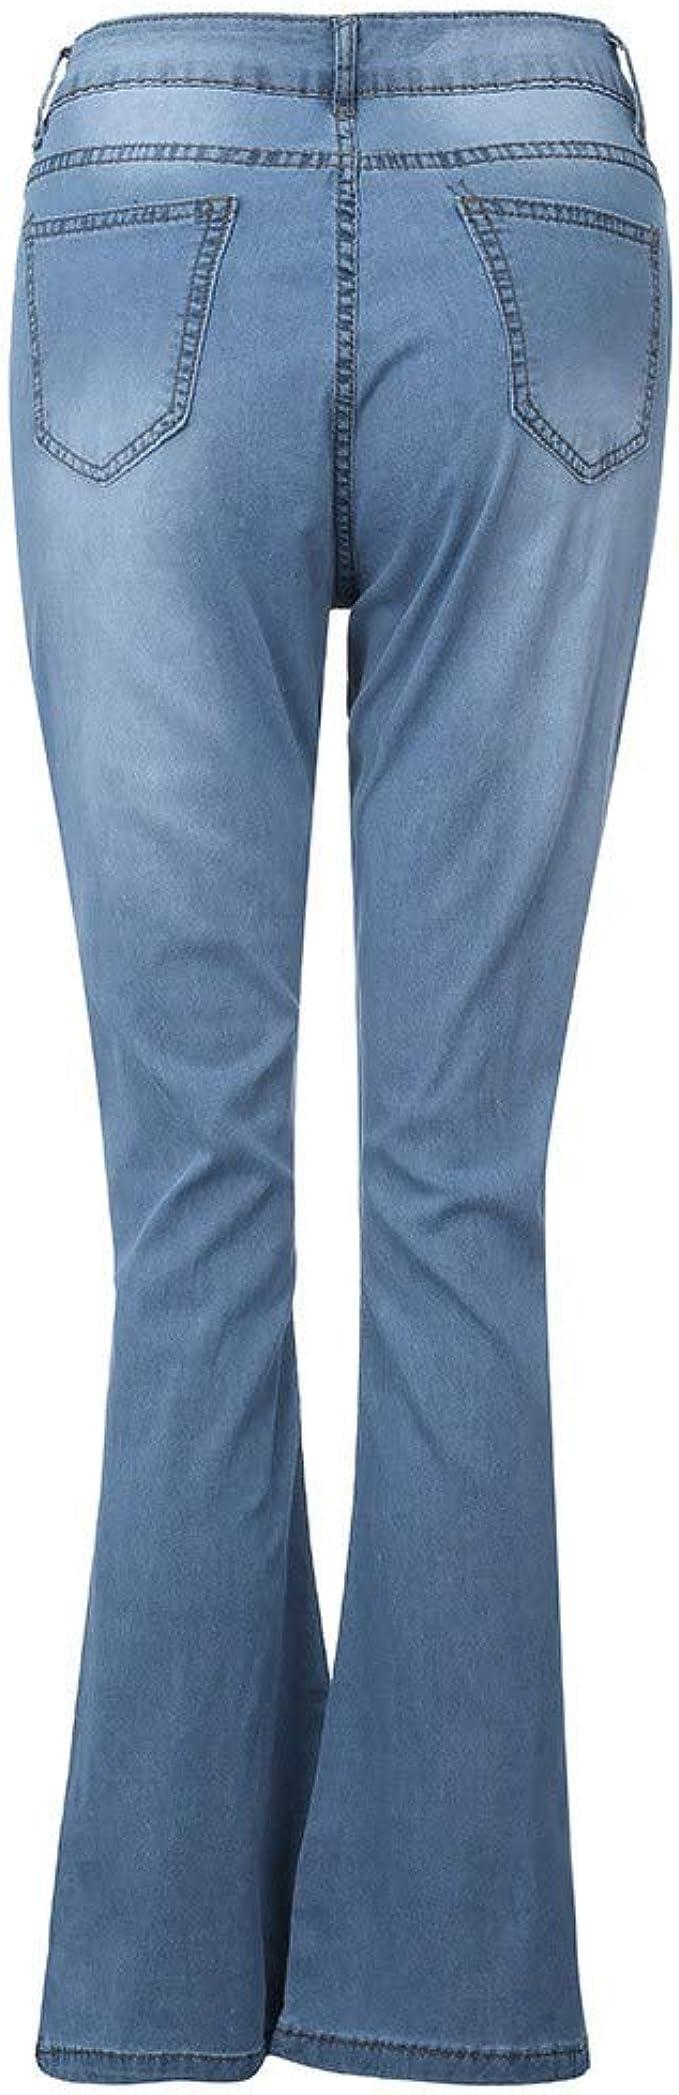 SADUORHAPPY Womens Drawstring Jeans Comfy Stretch Ripped Jeans Distressed Frayed Denim Skinny Jeans